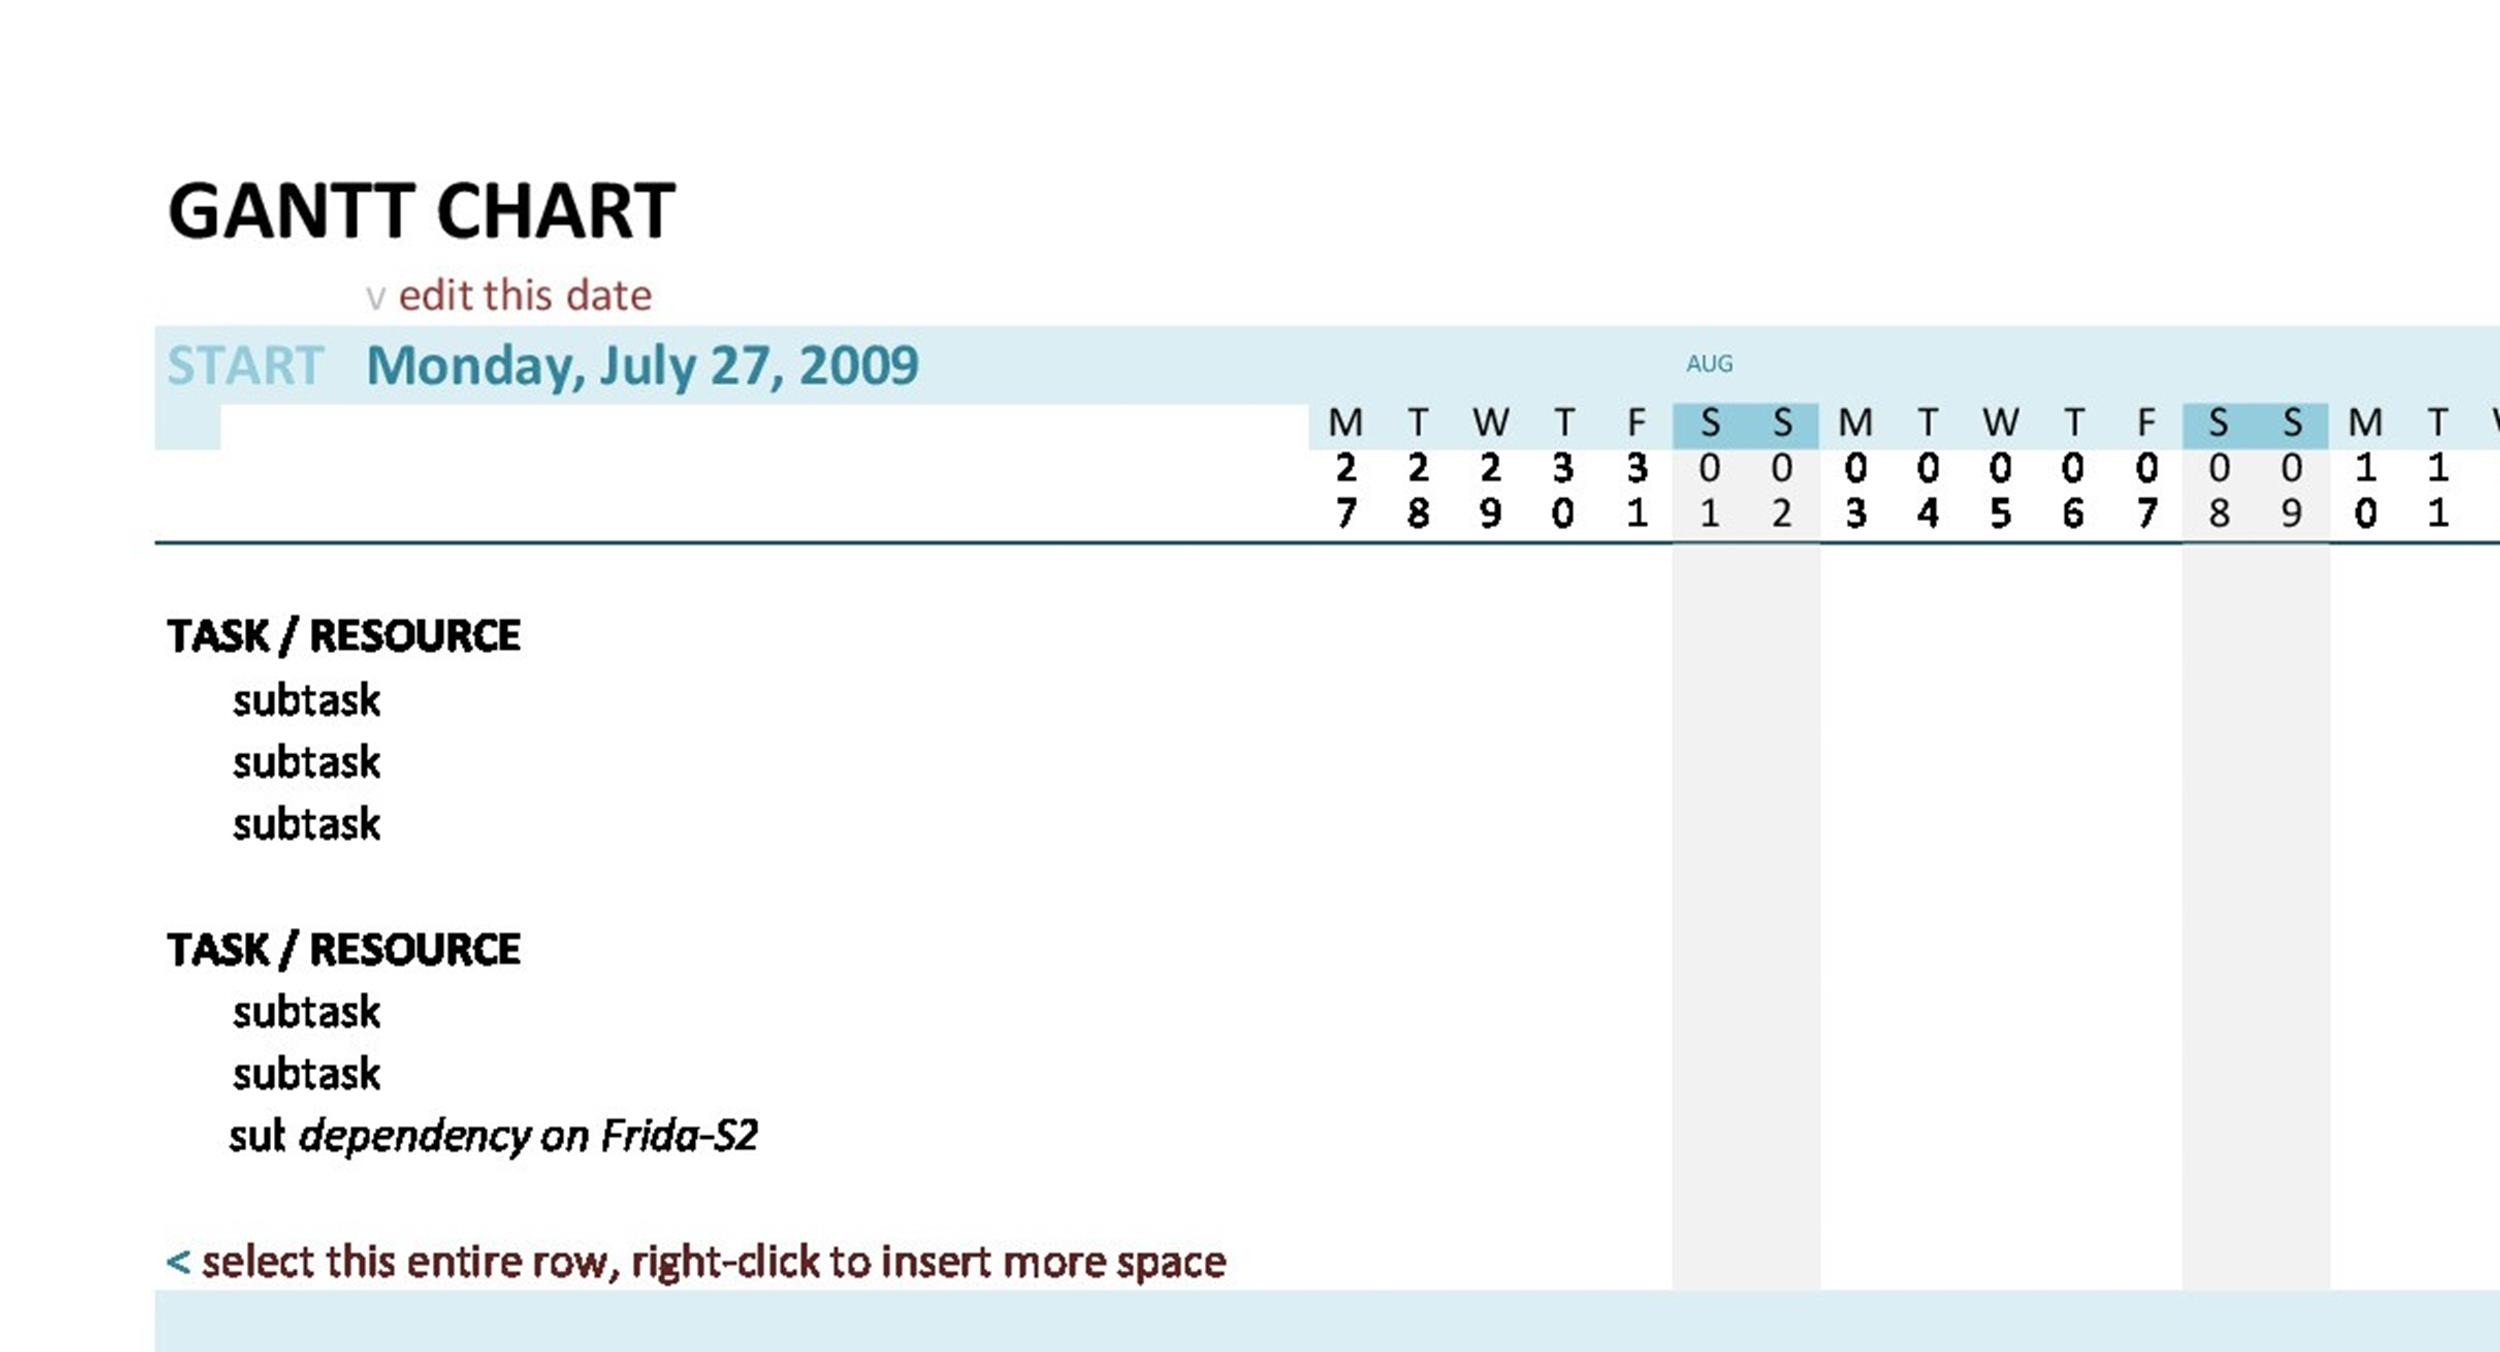 Free Grantt Chart Template 16